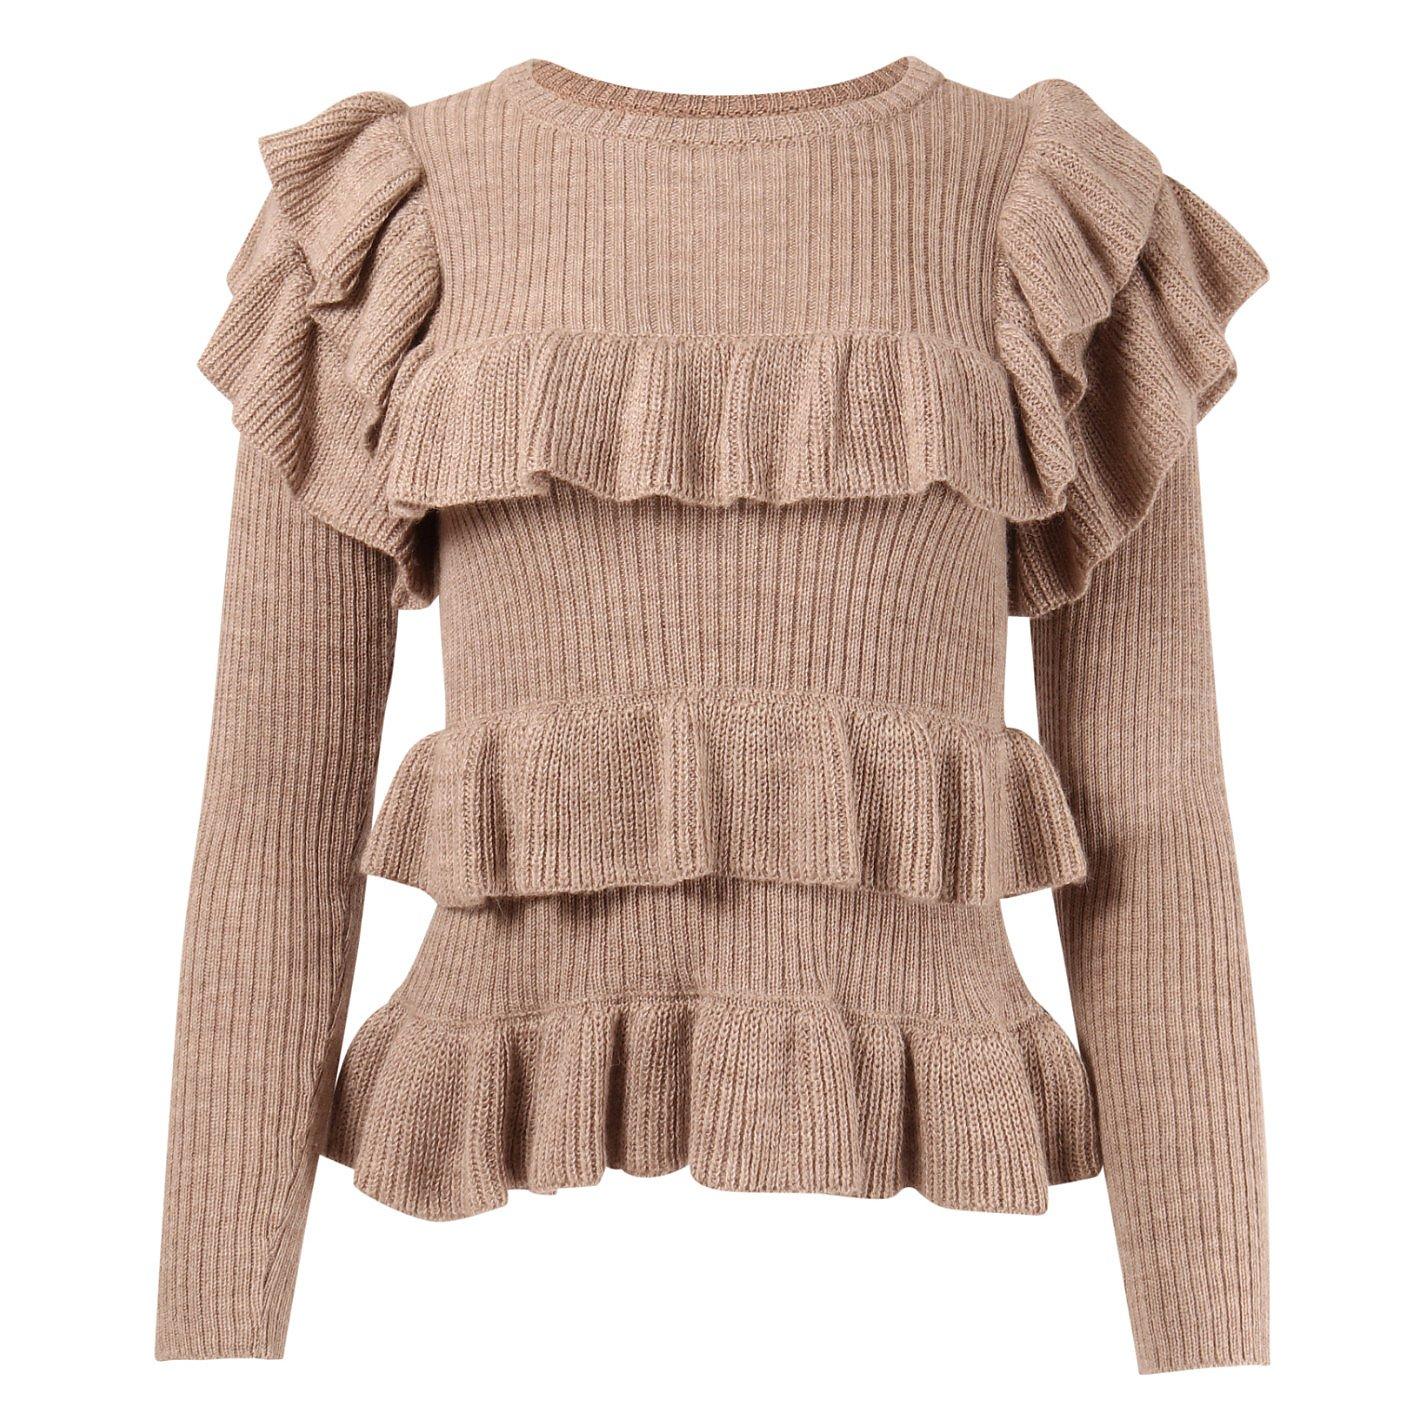 Ulla Johnson Ruffled Knit Sweater